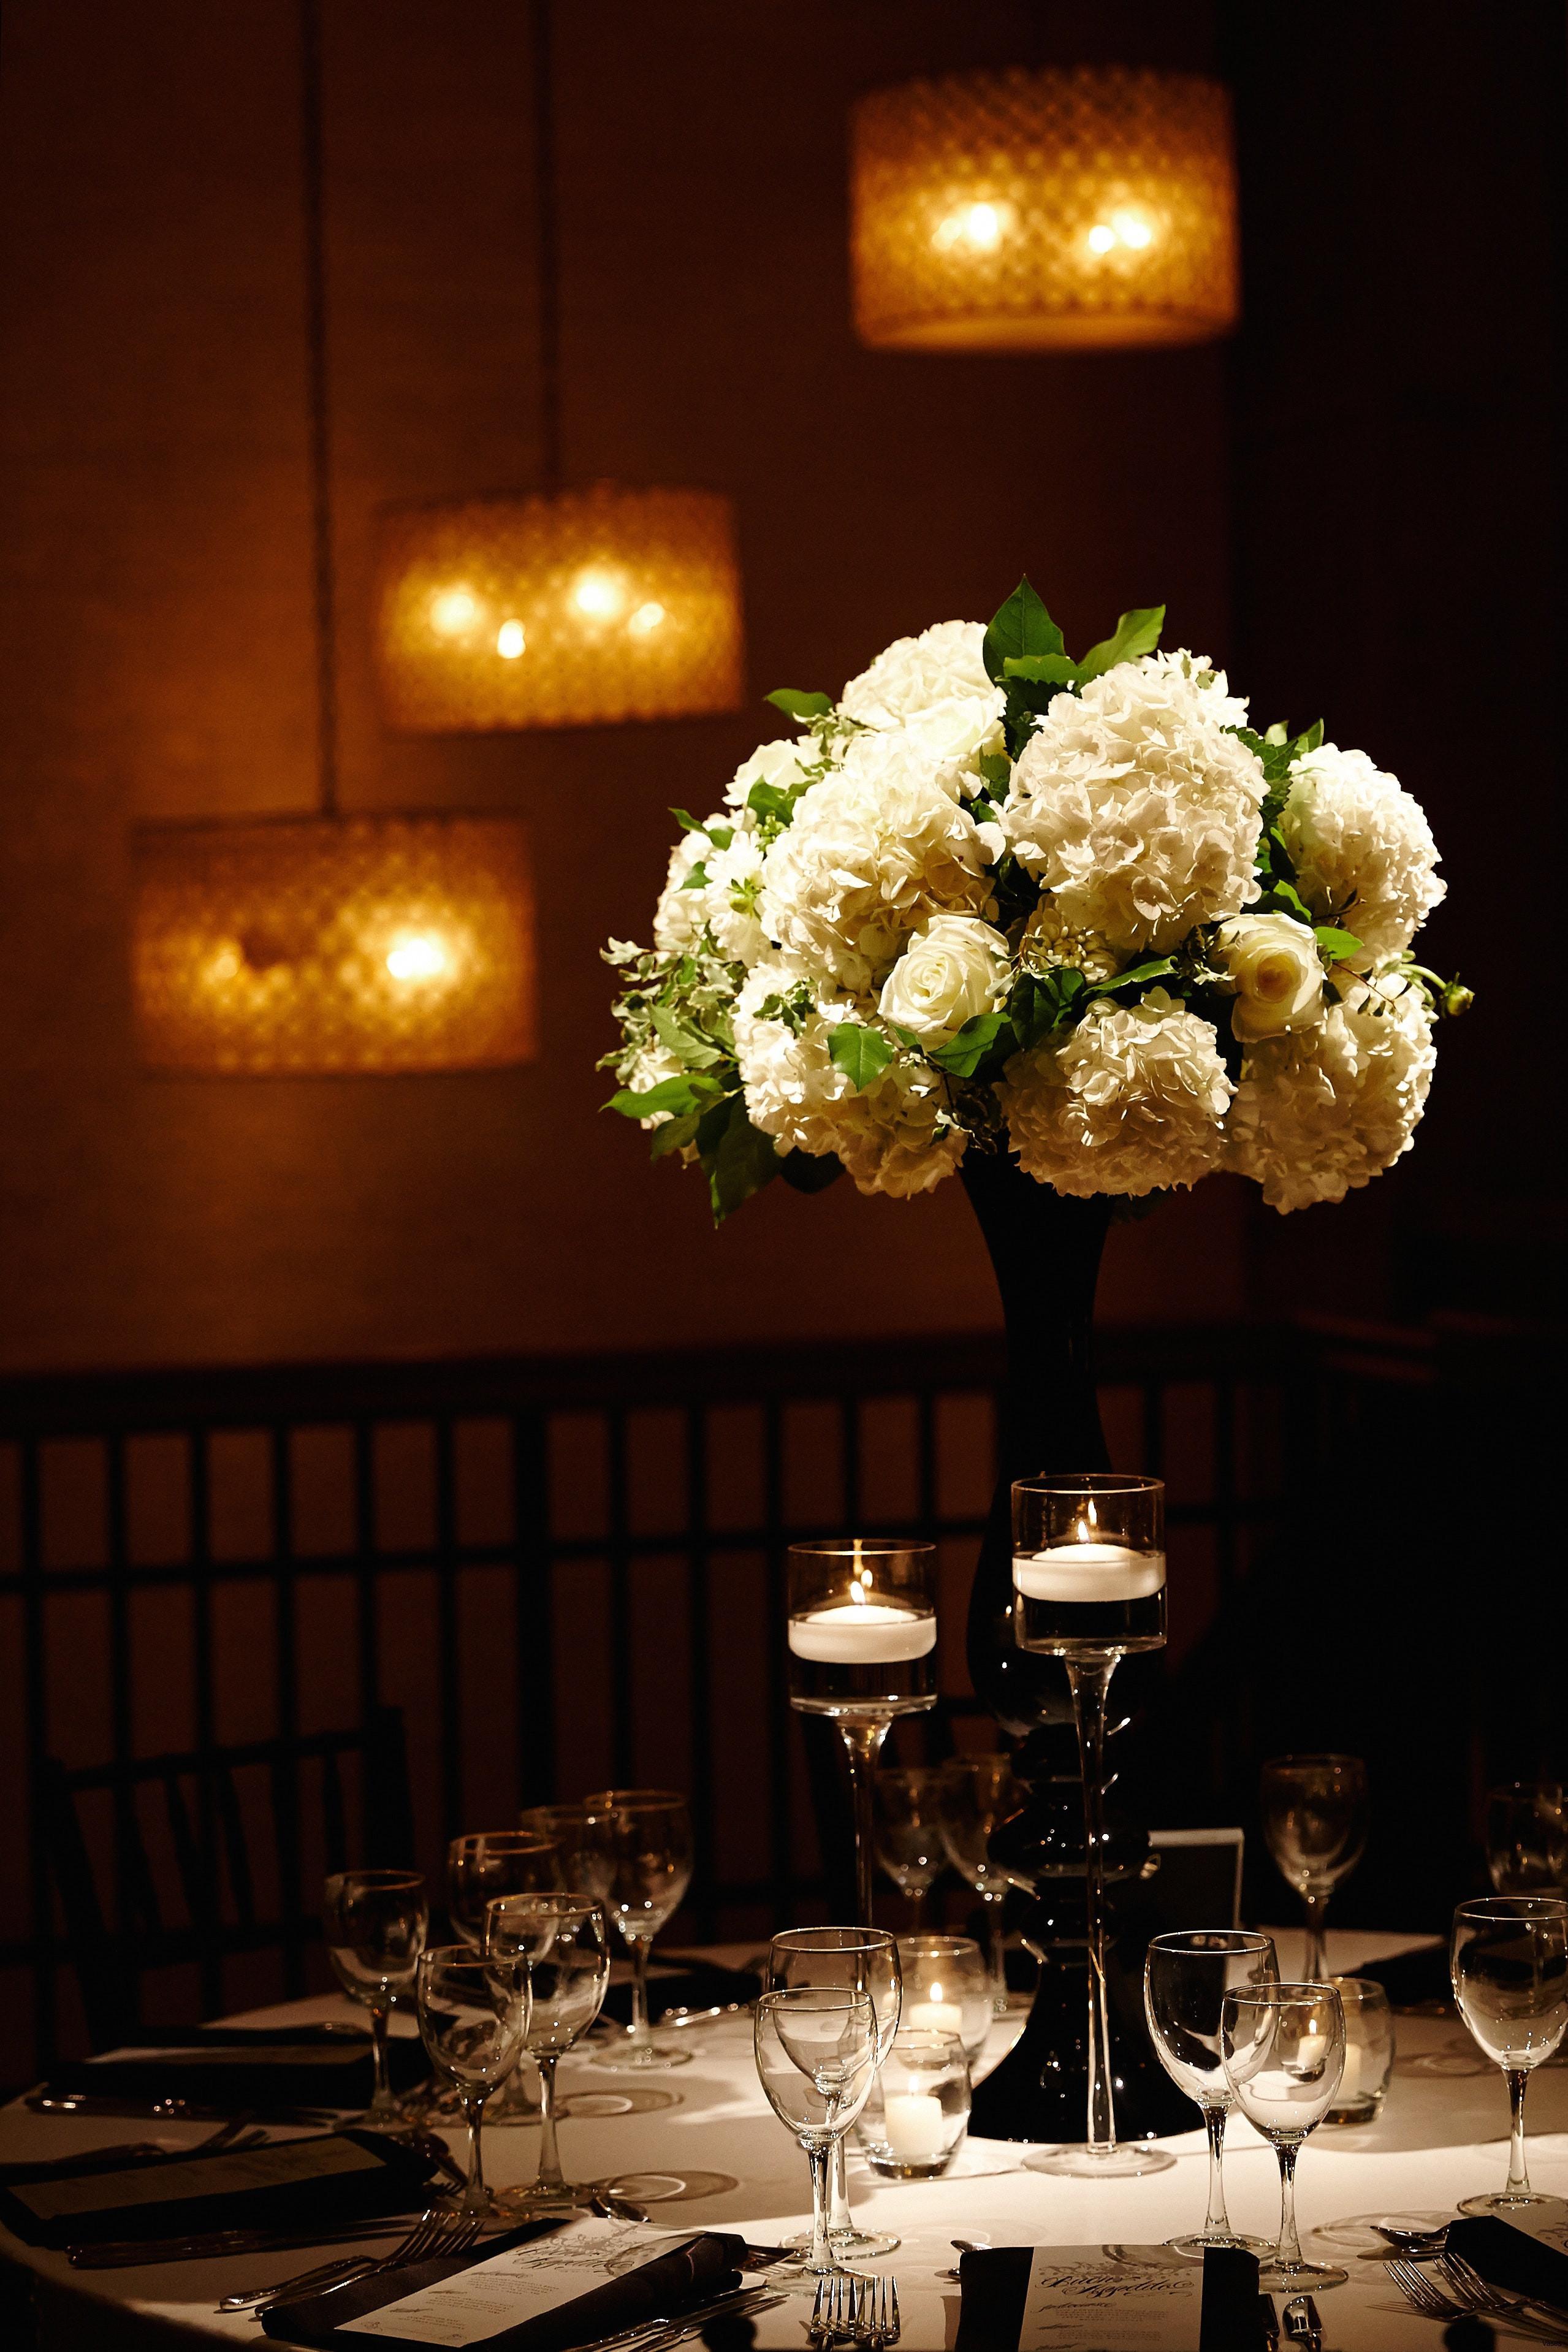 lalique vase with doves of 20 inspirational tall white vase bogekompresorturkiye com for il fullxfull h vases black vase white flowers zoomi 0d with design design tall vase